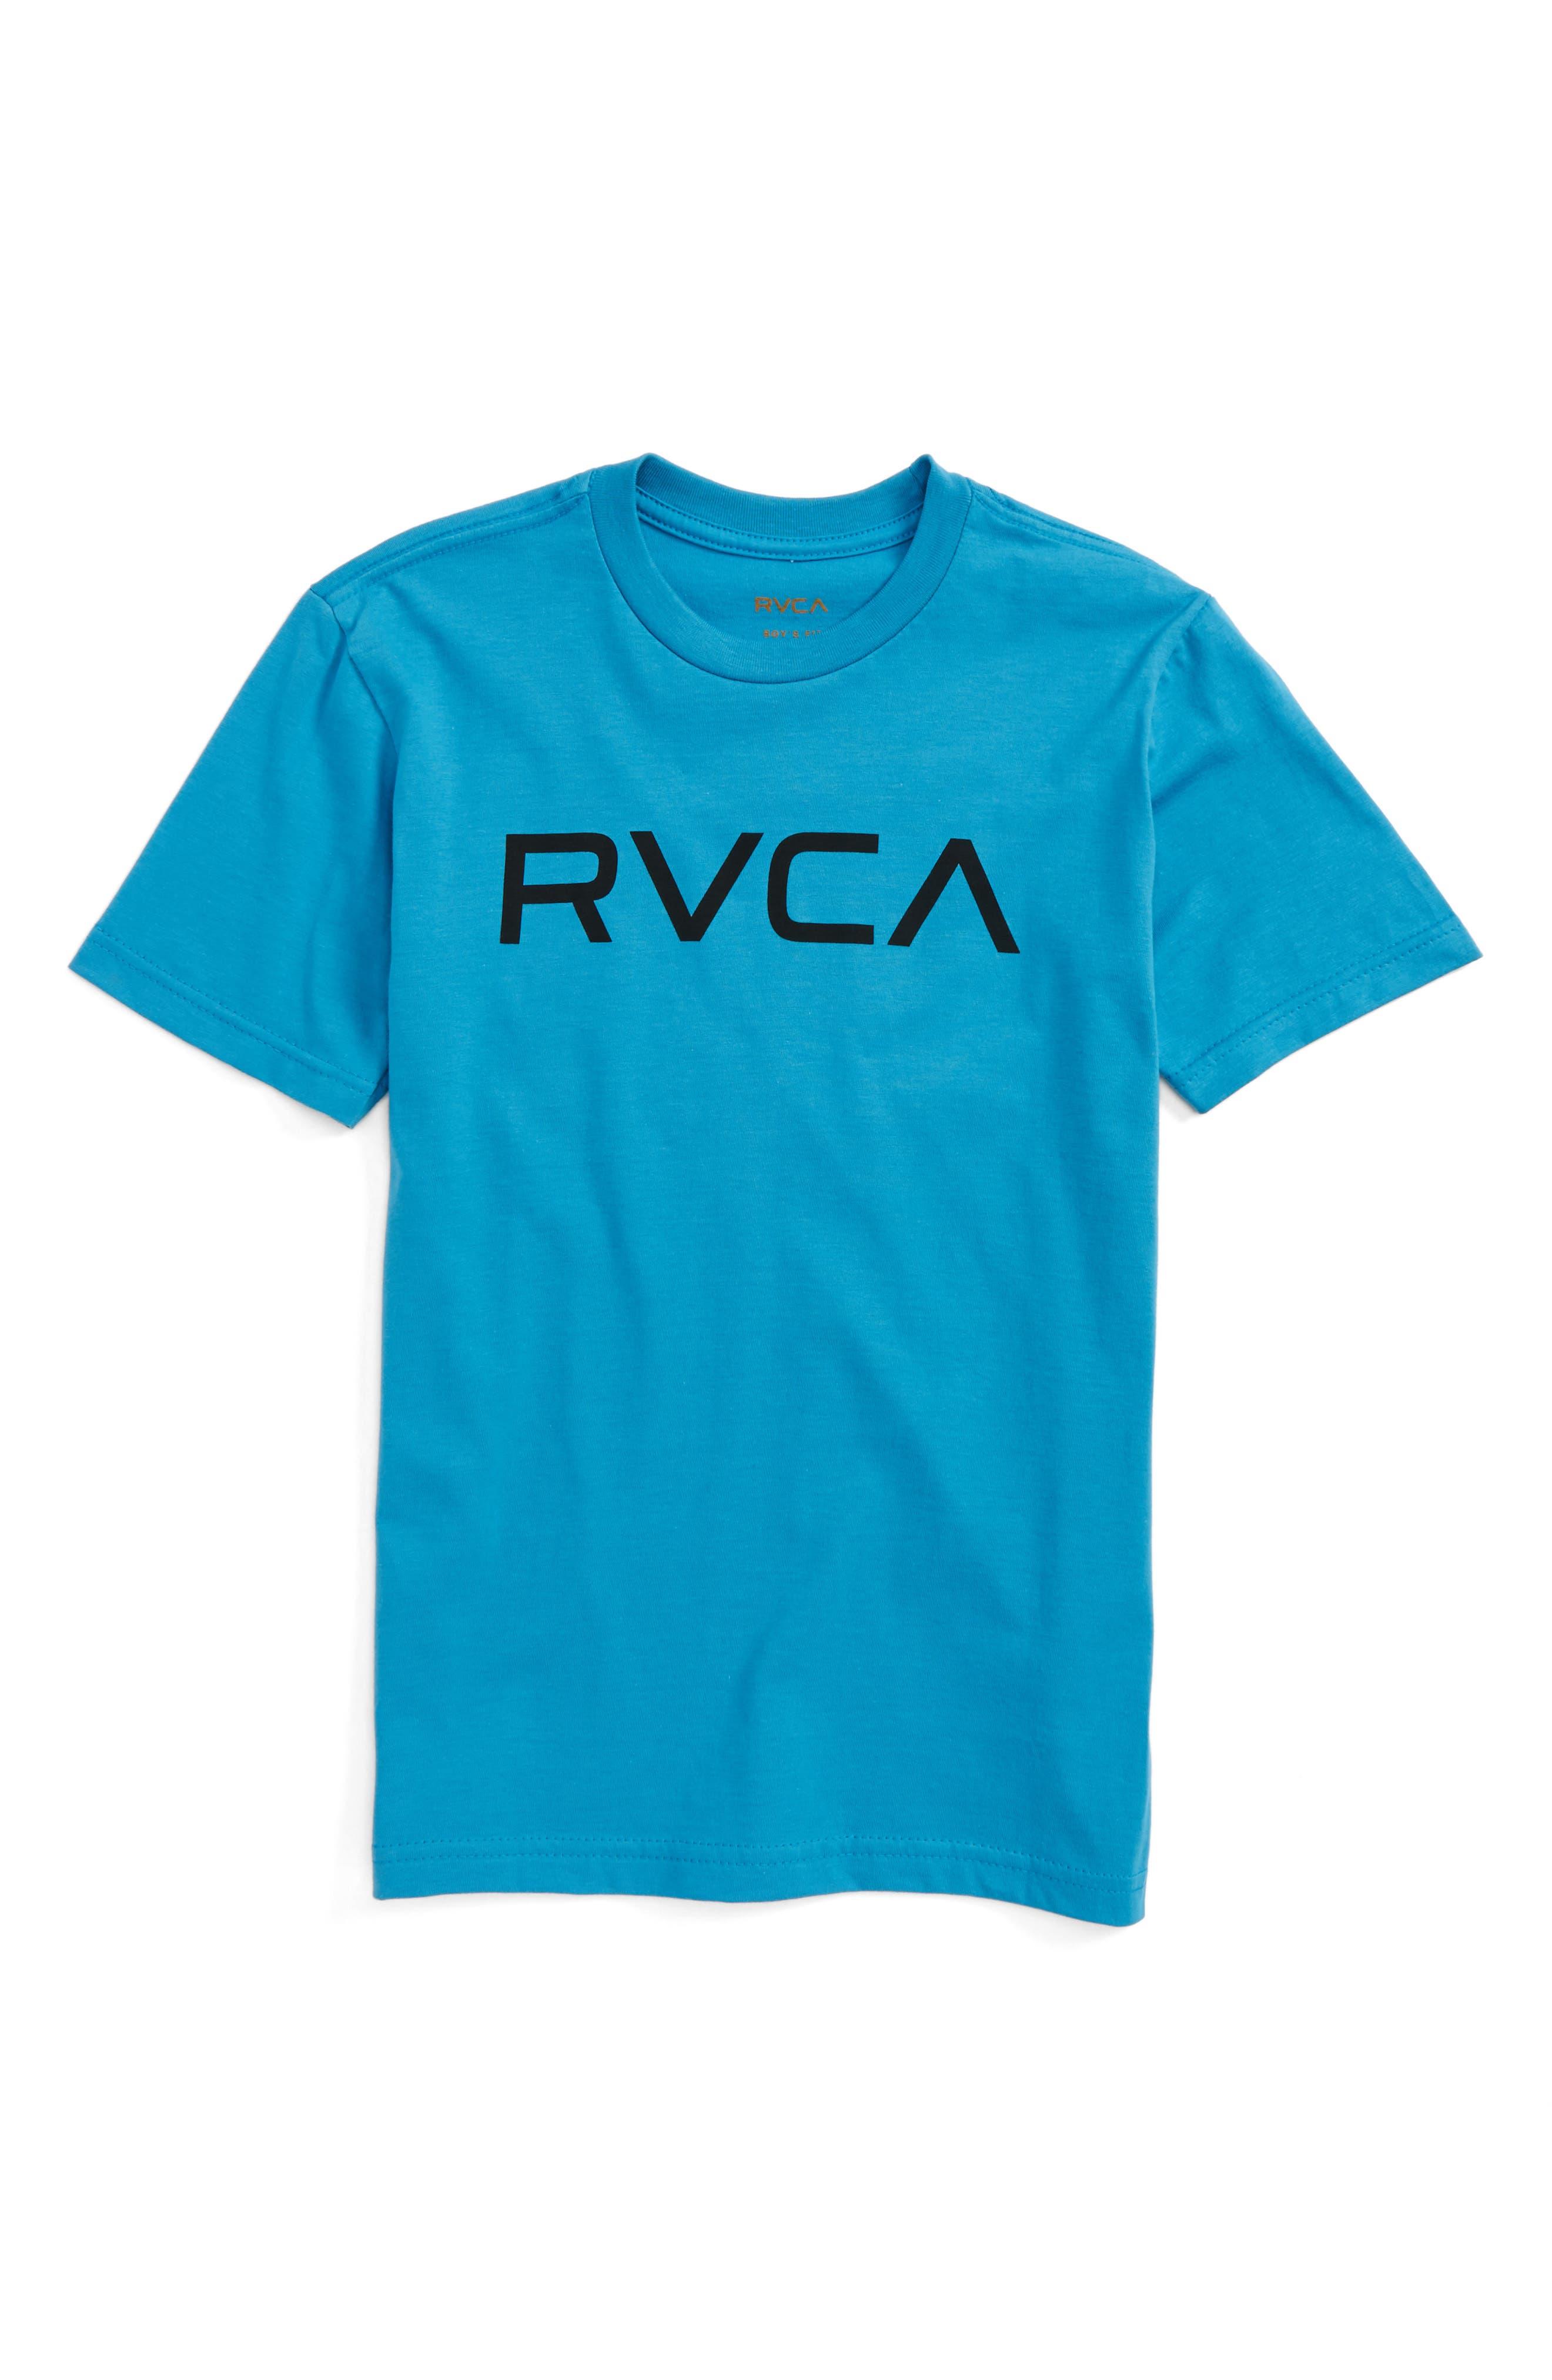 RVCA Logo Graphic T-Shirt